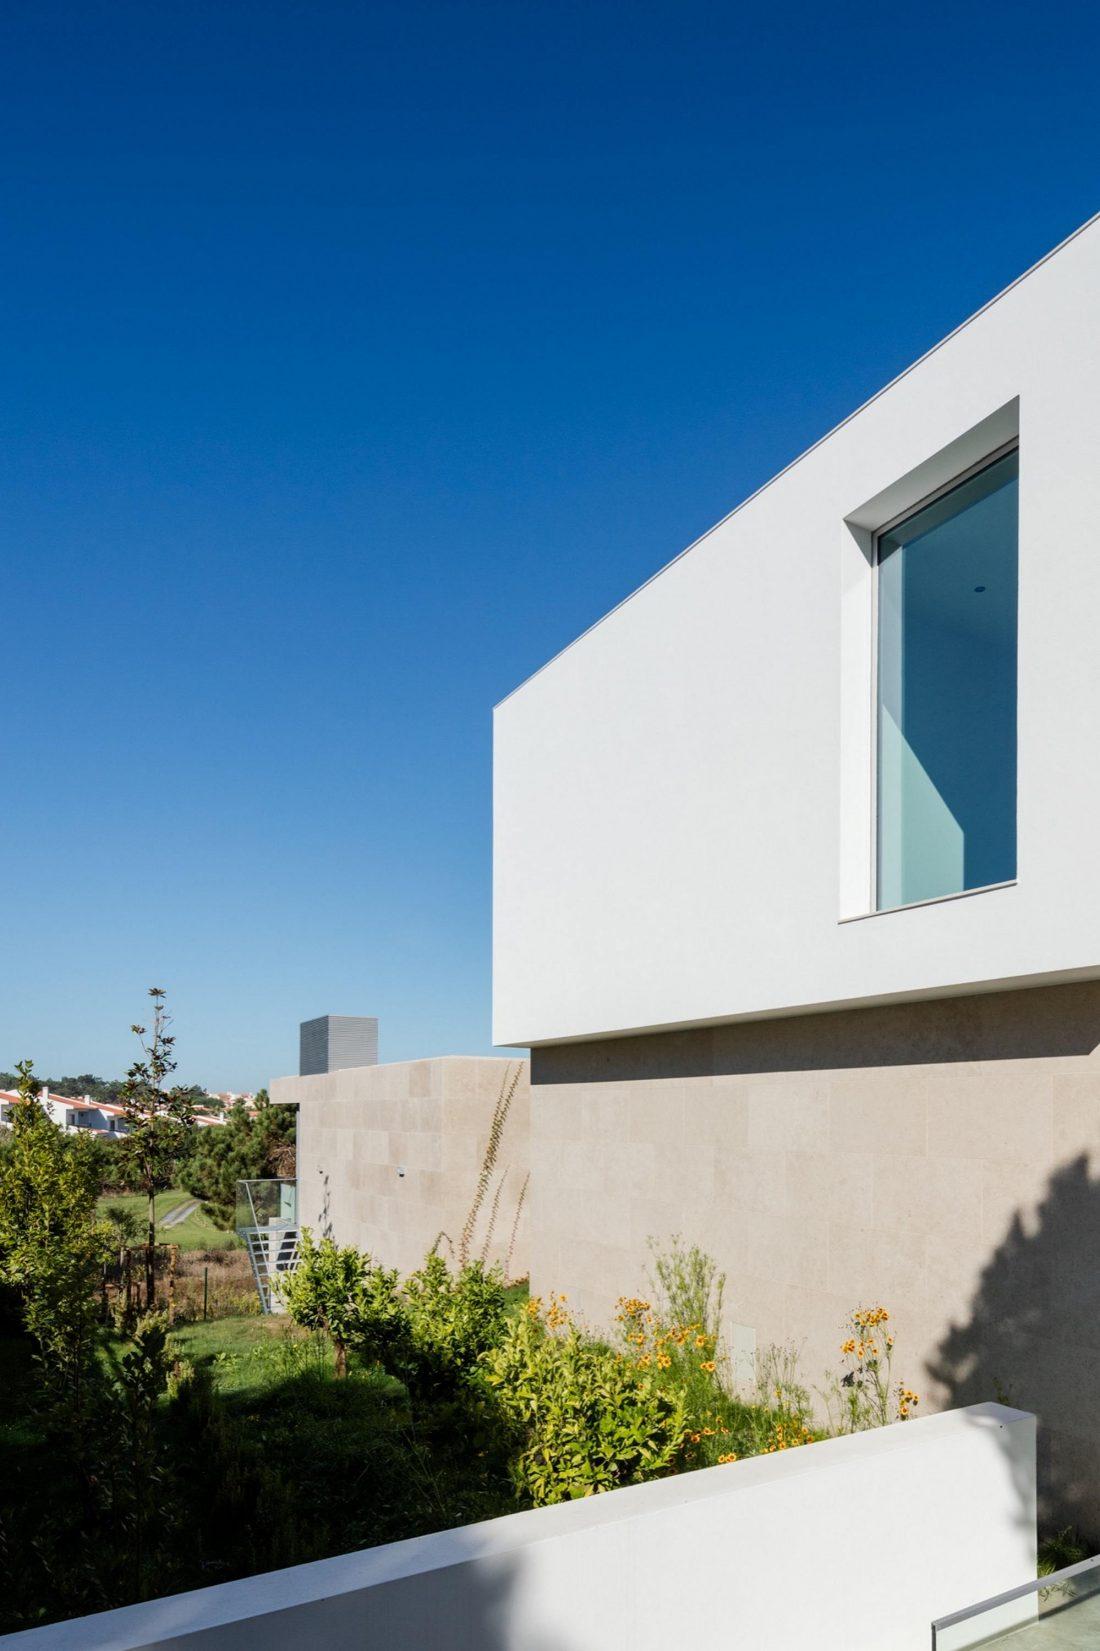 Дом в Обидуше, Португалия, от студии RSM arquitecto и Russell Jones Architects 13